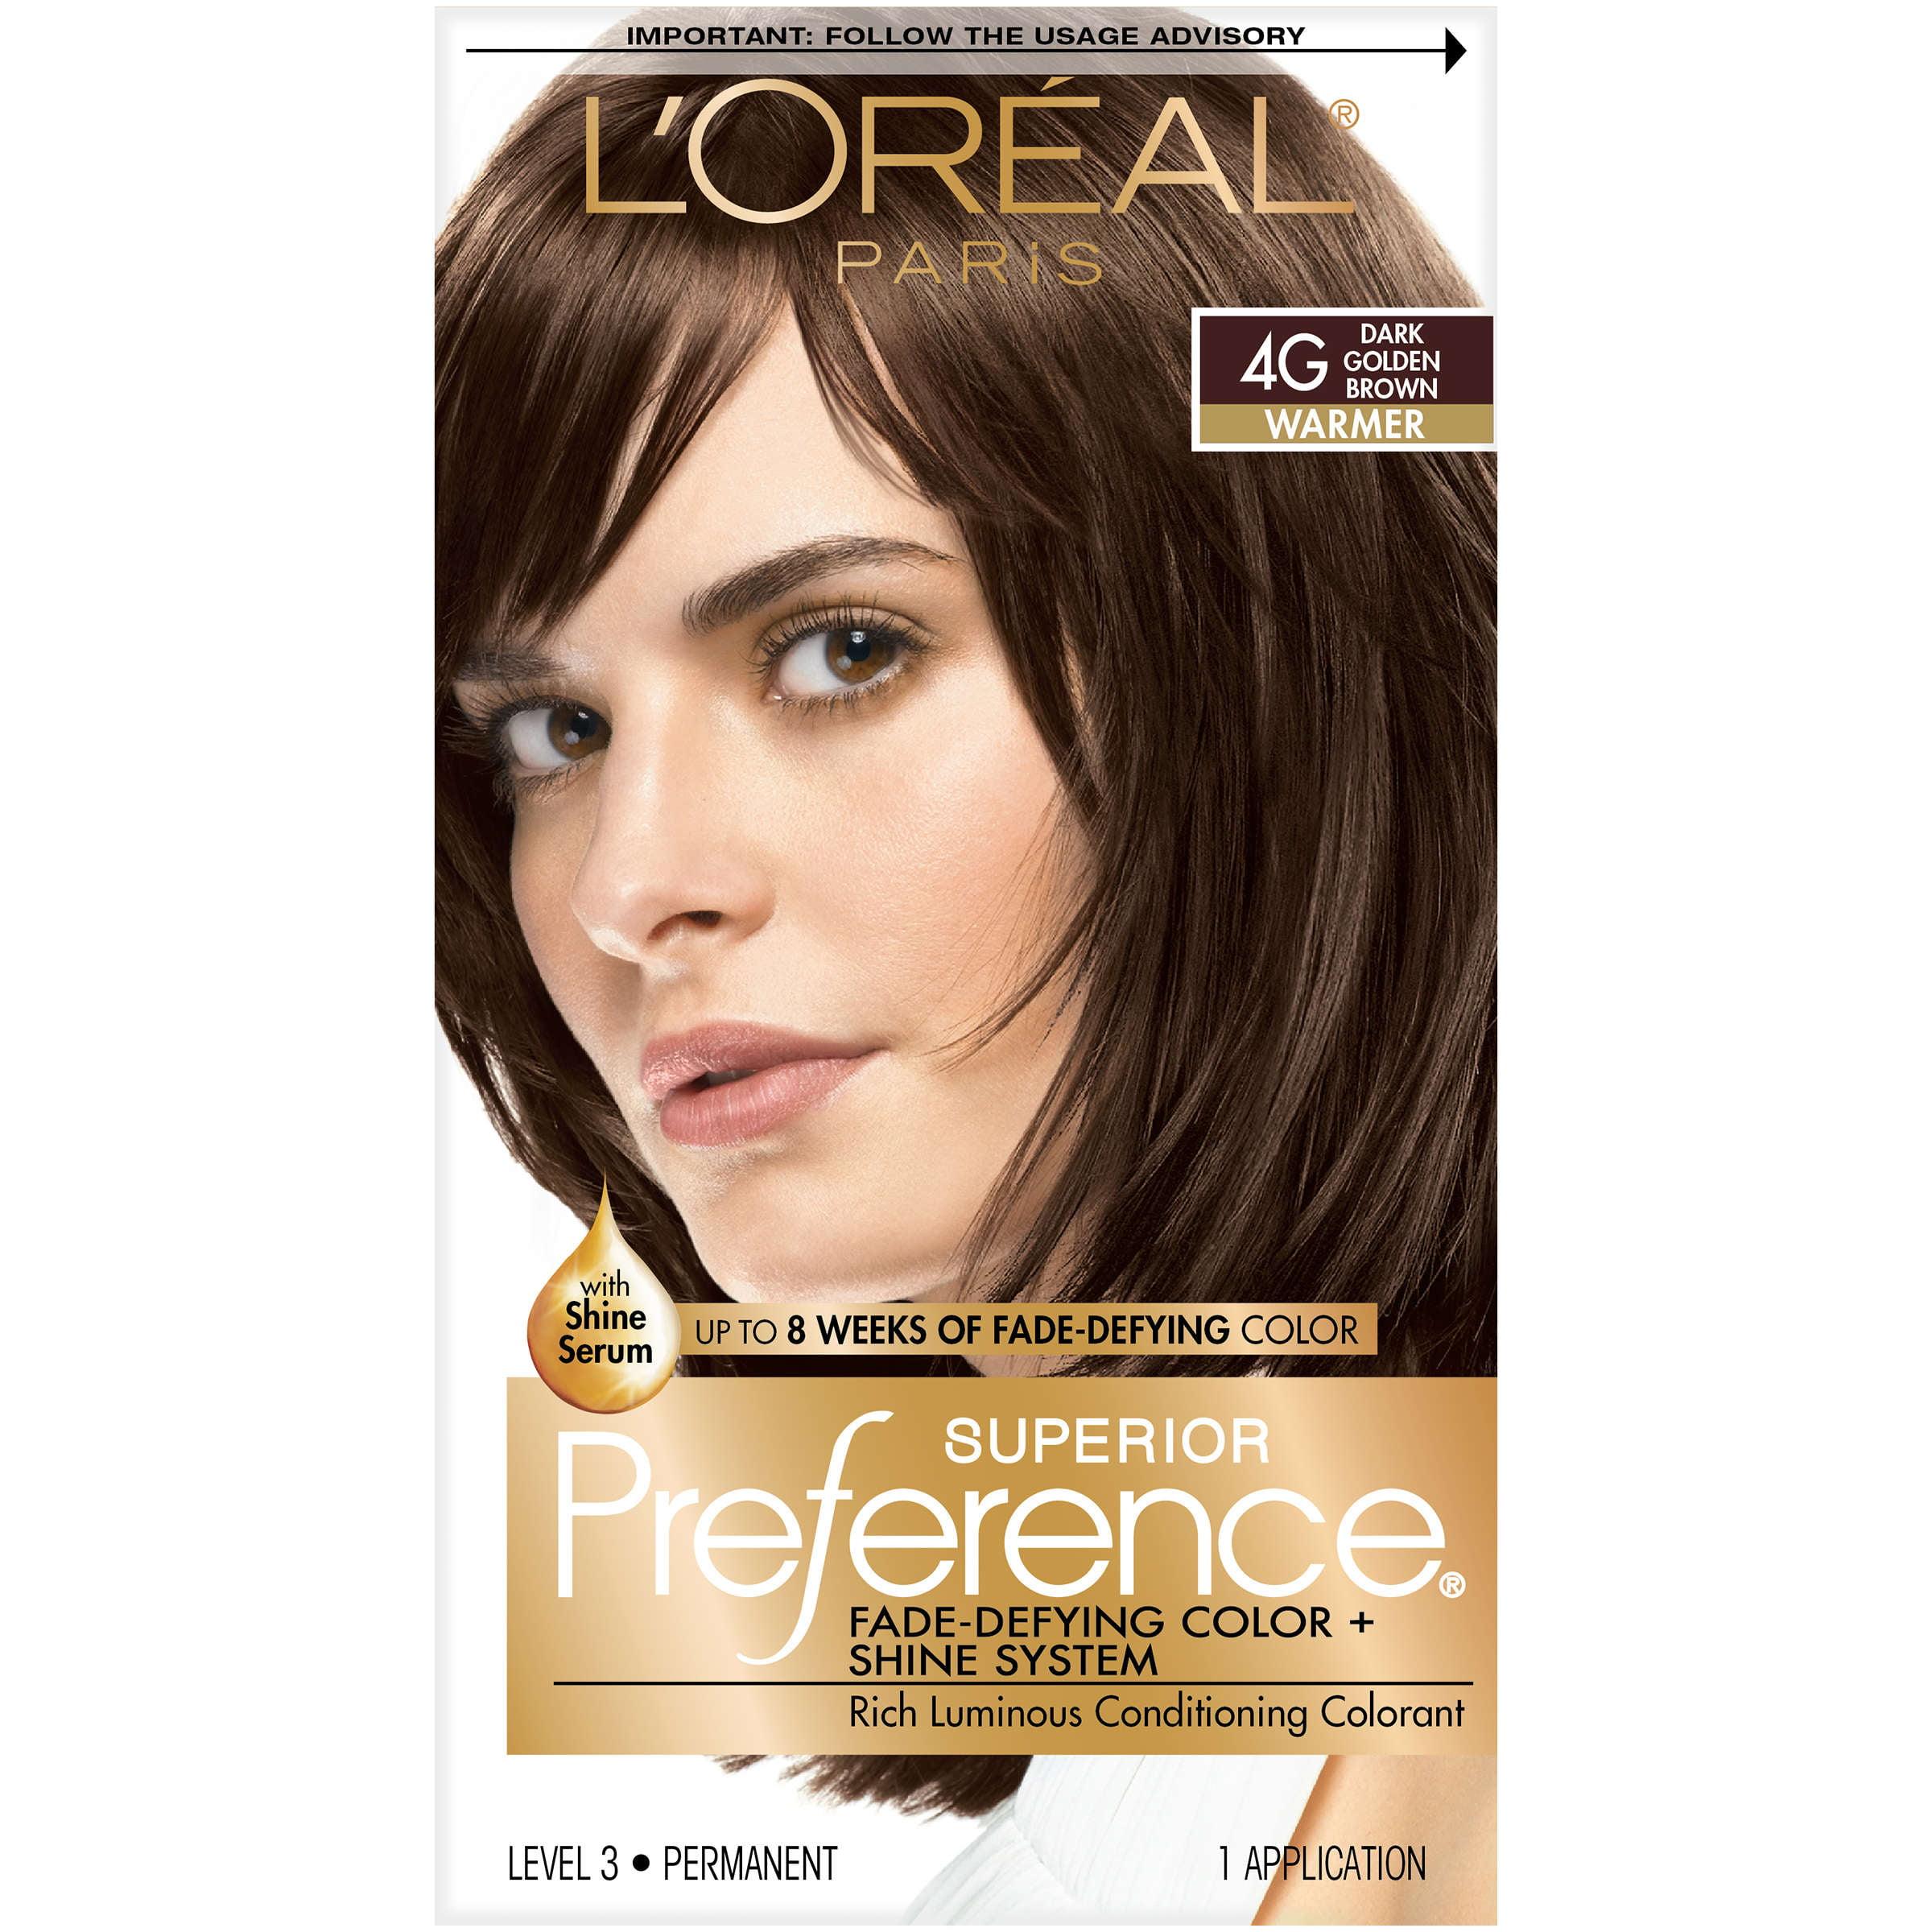 Loreal Paris Superior Preference Fade Defying Color Shine Hair